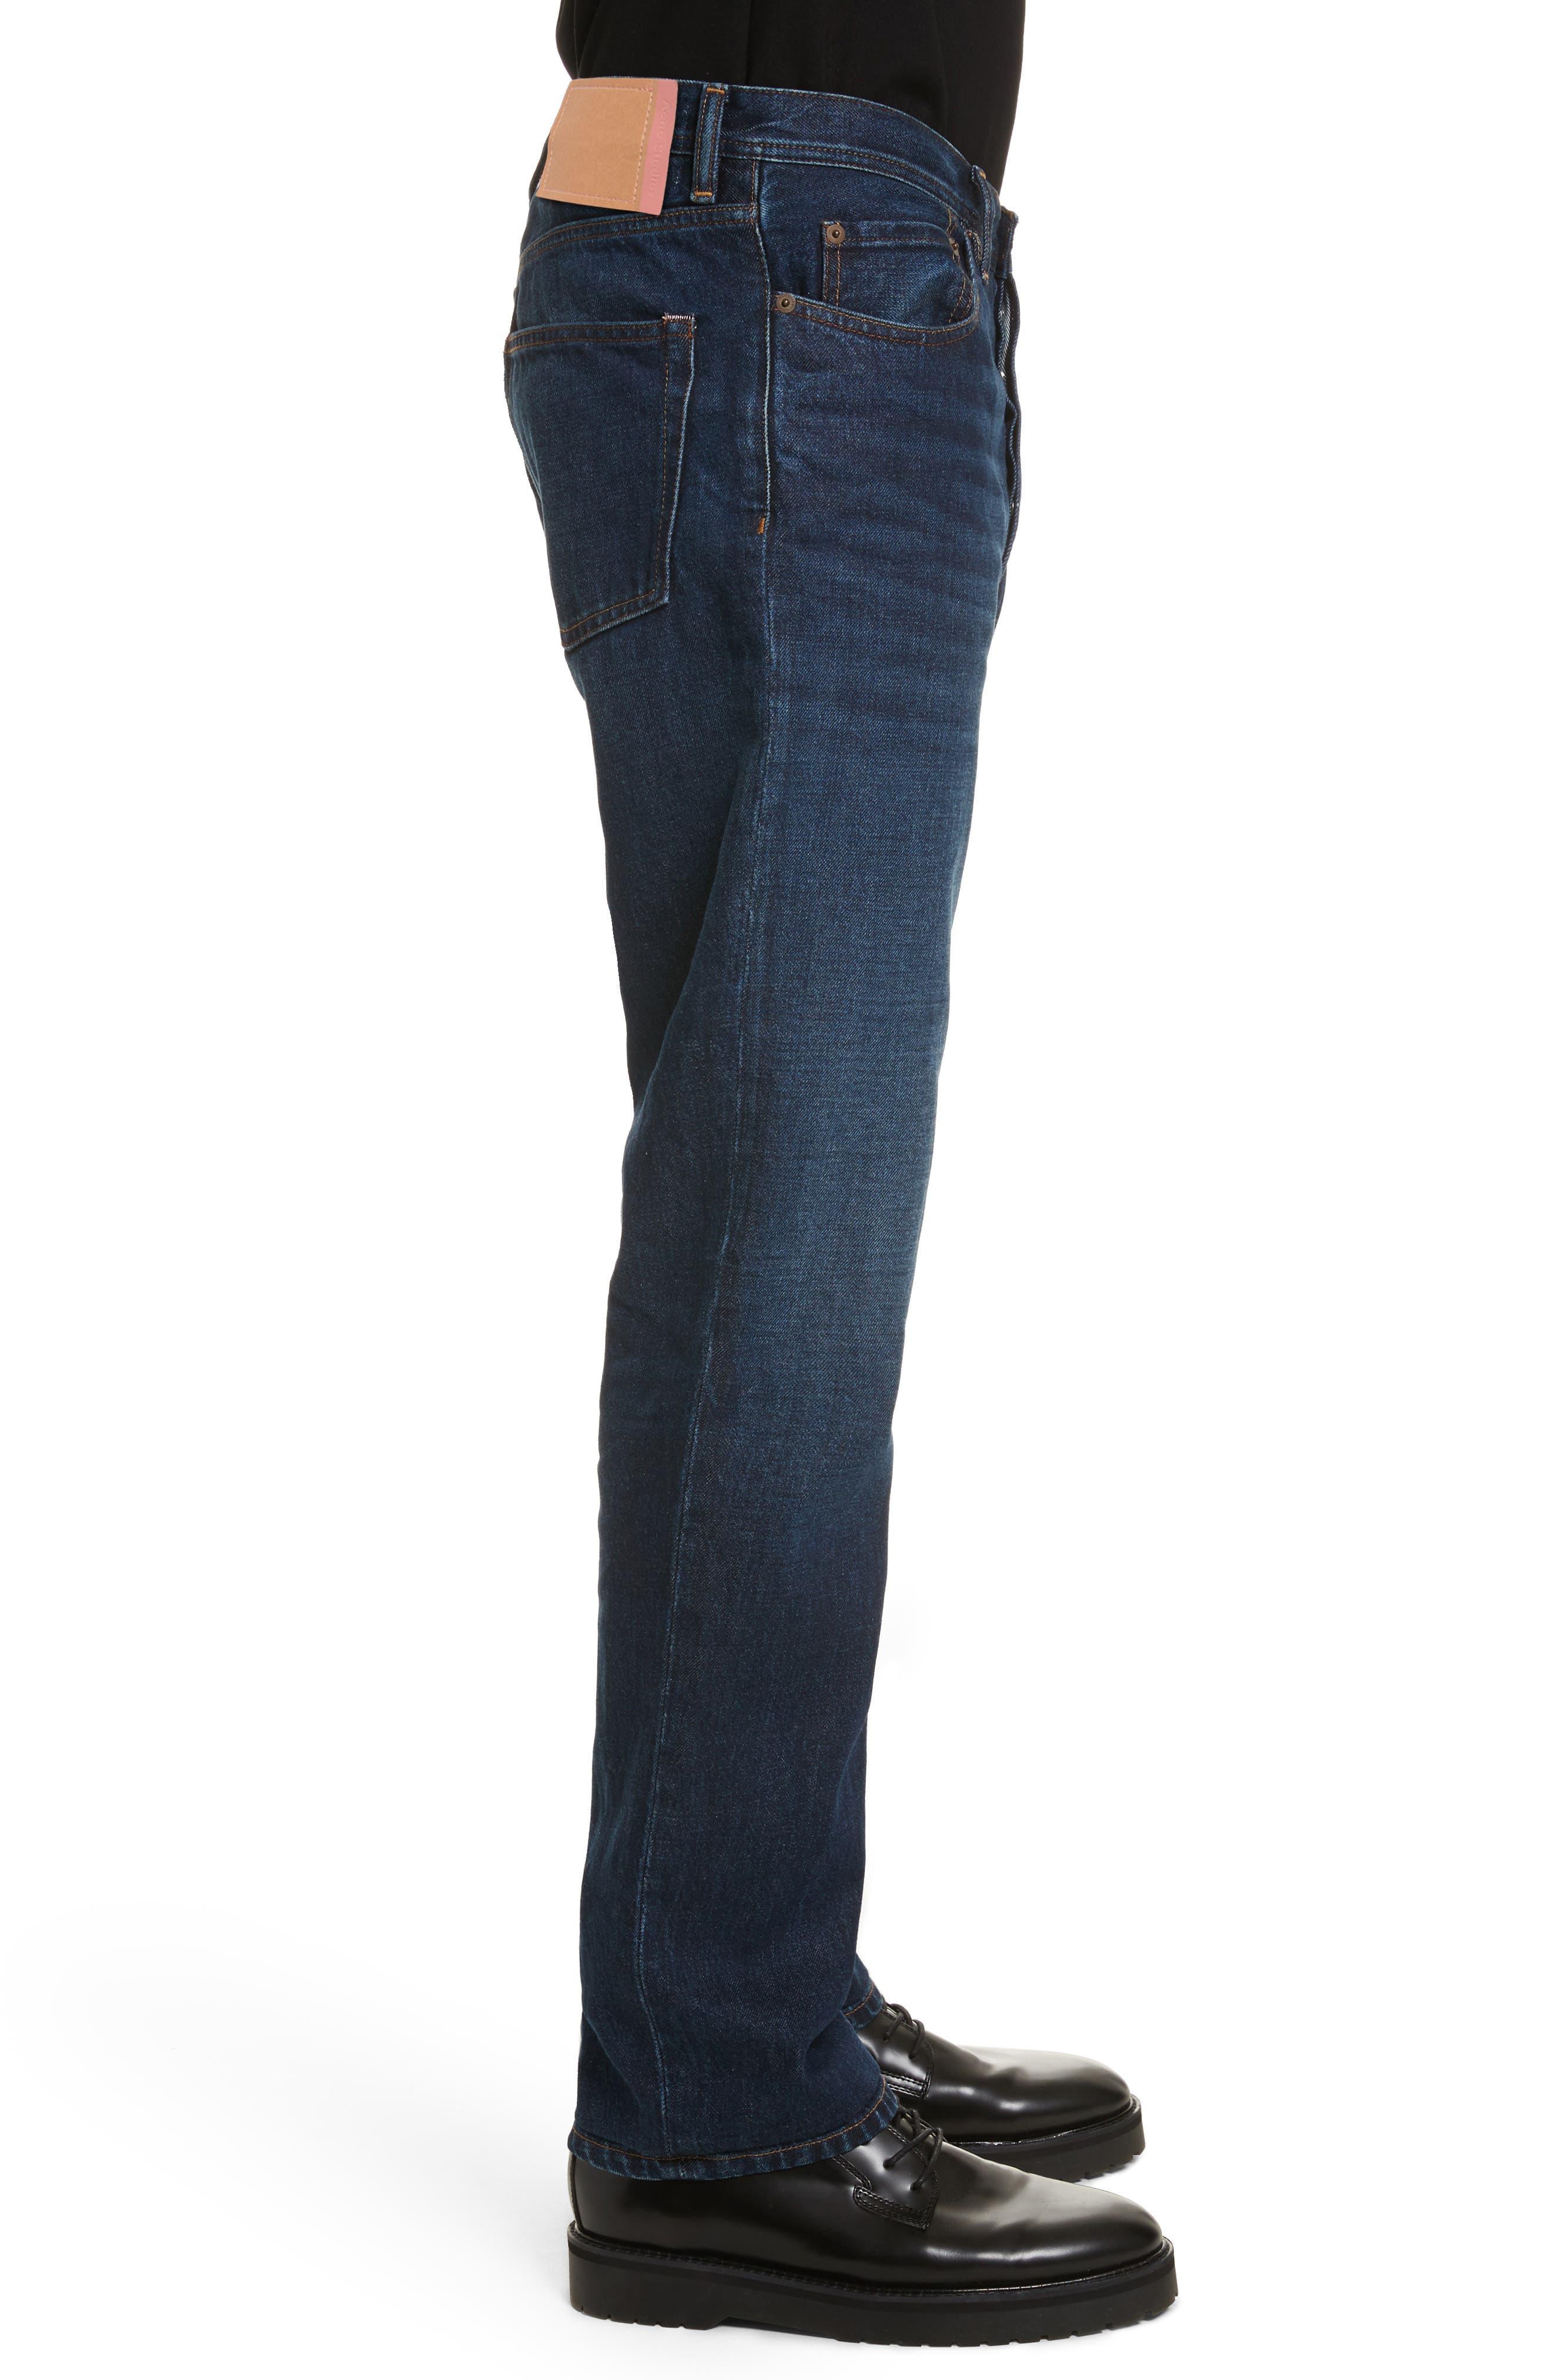 Land Classic Straight Leg Jeans,                             Alternate thumbnail 3, color,                             123 Dk Blue